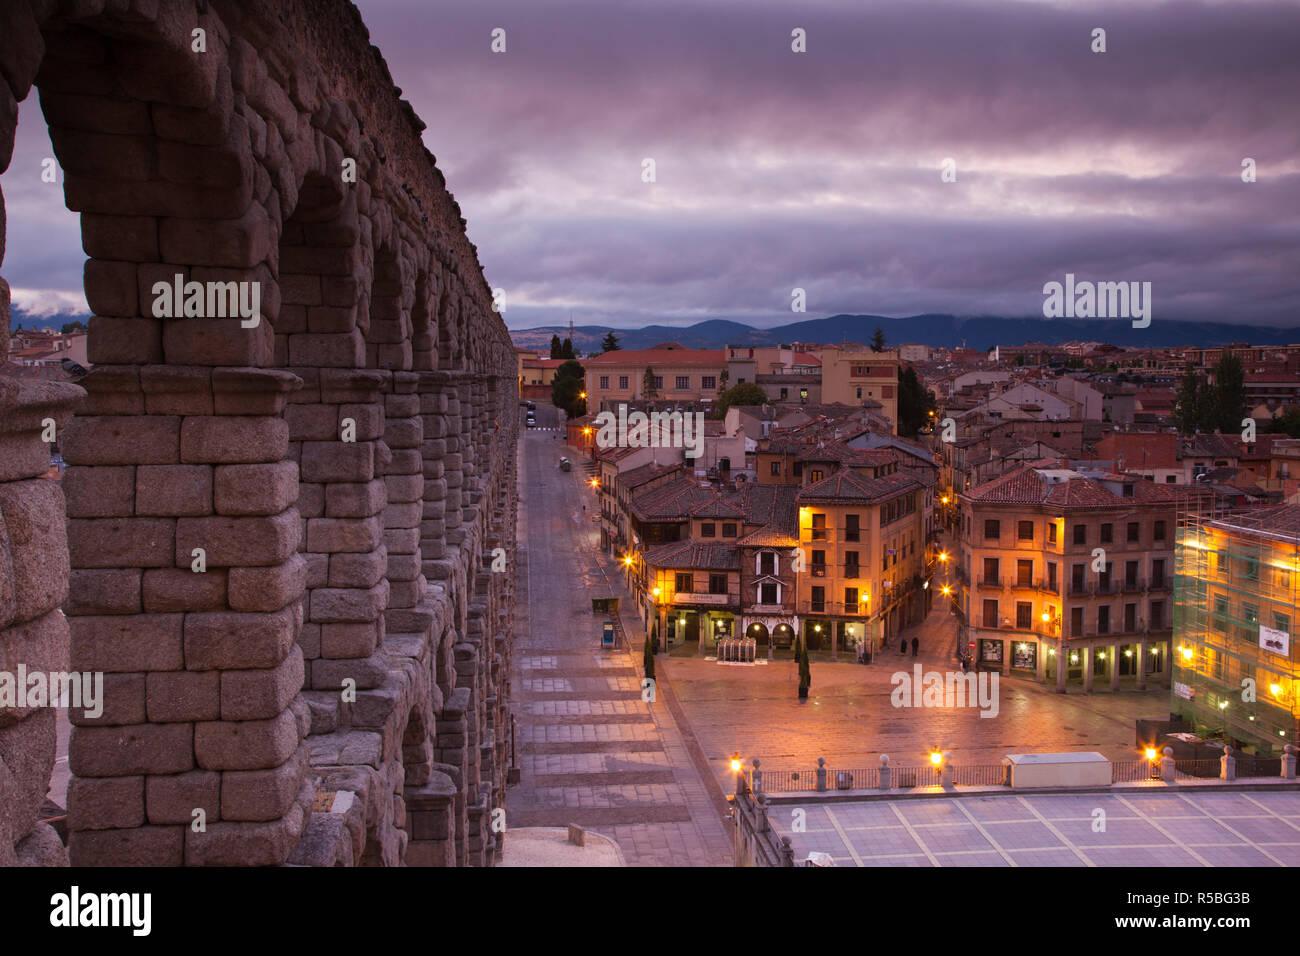 Spain, Castilla y Leon Region, Segovia Province, Segovia, town view over Plaza Azoguejo with El Acueducto, Roman Aqueduct - Stock Image